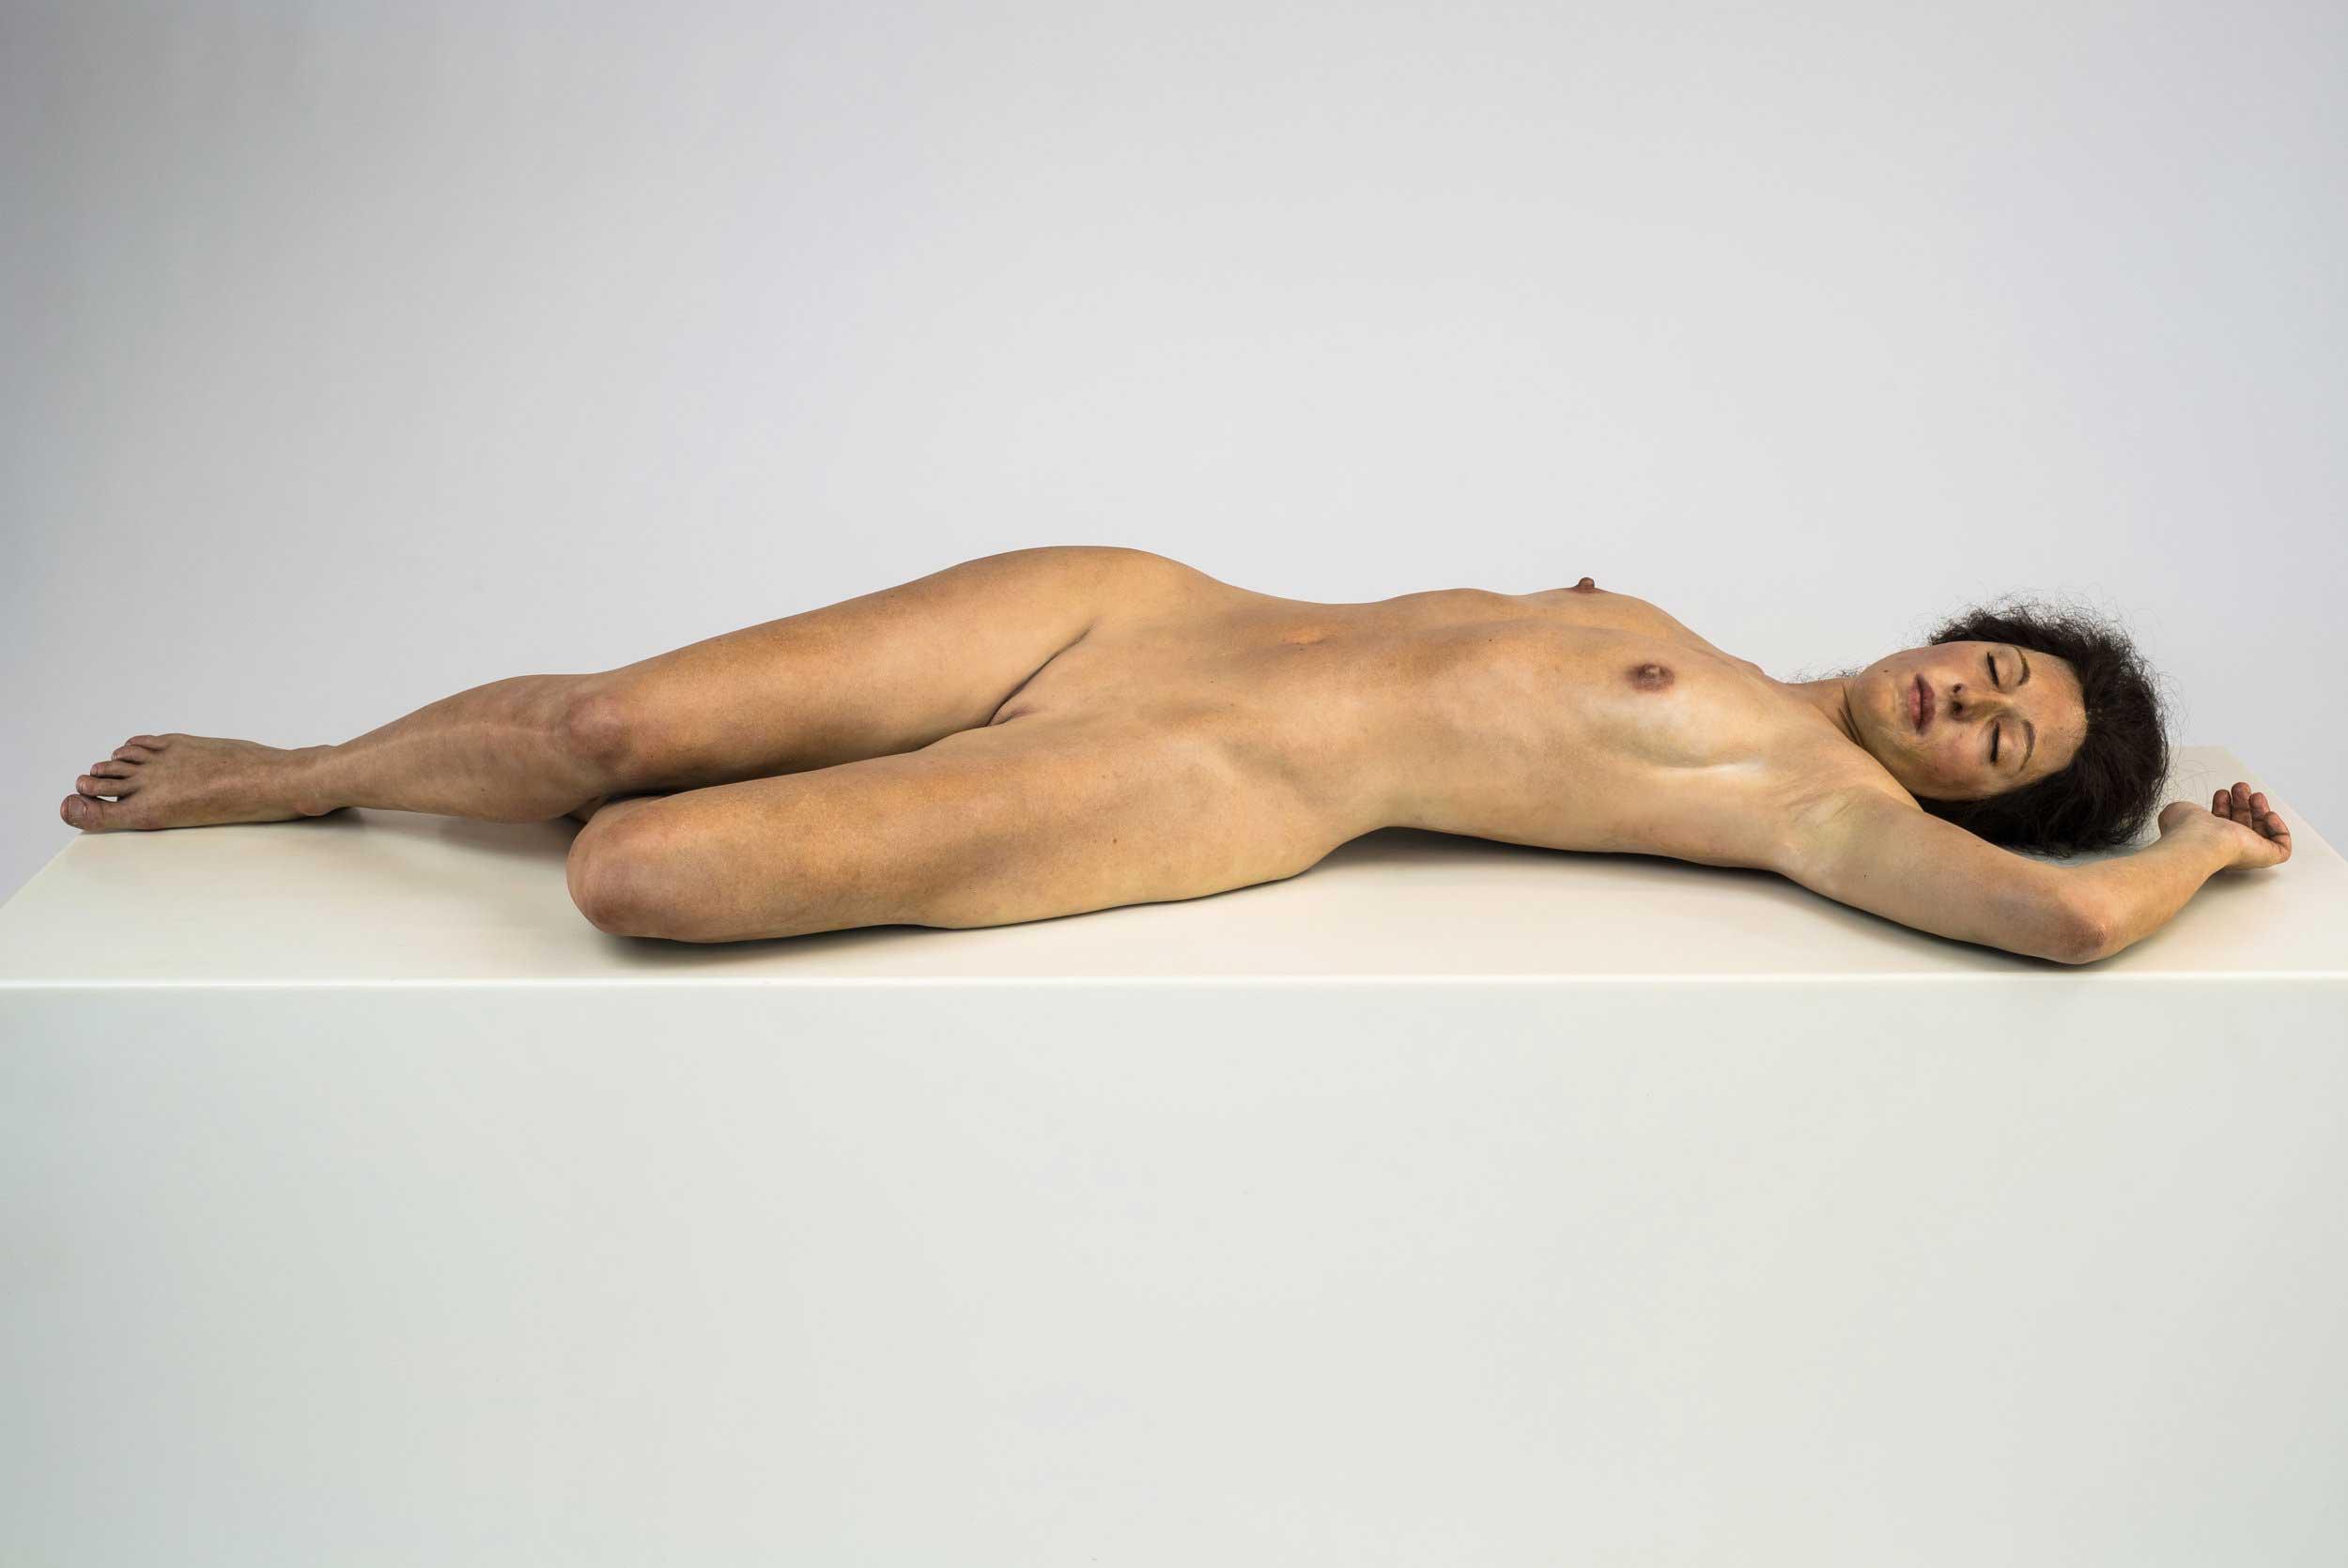 Lisa reclining, 2015